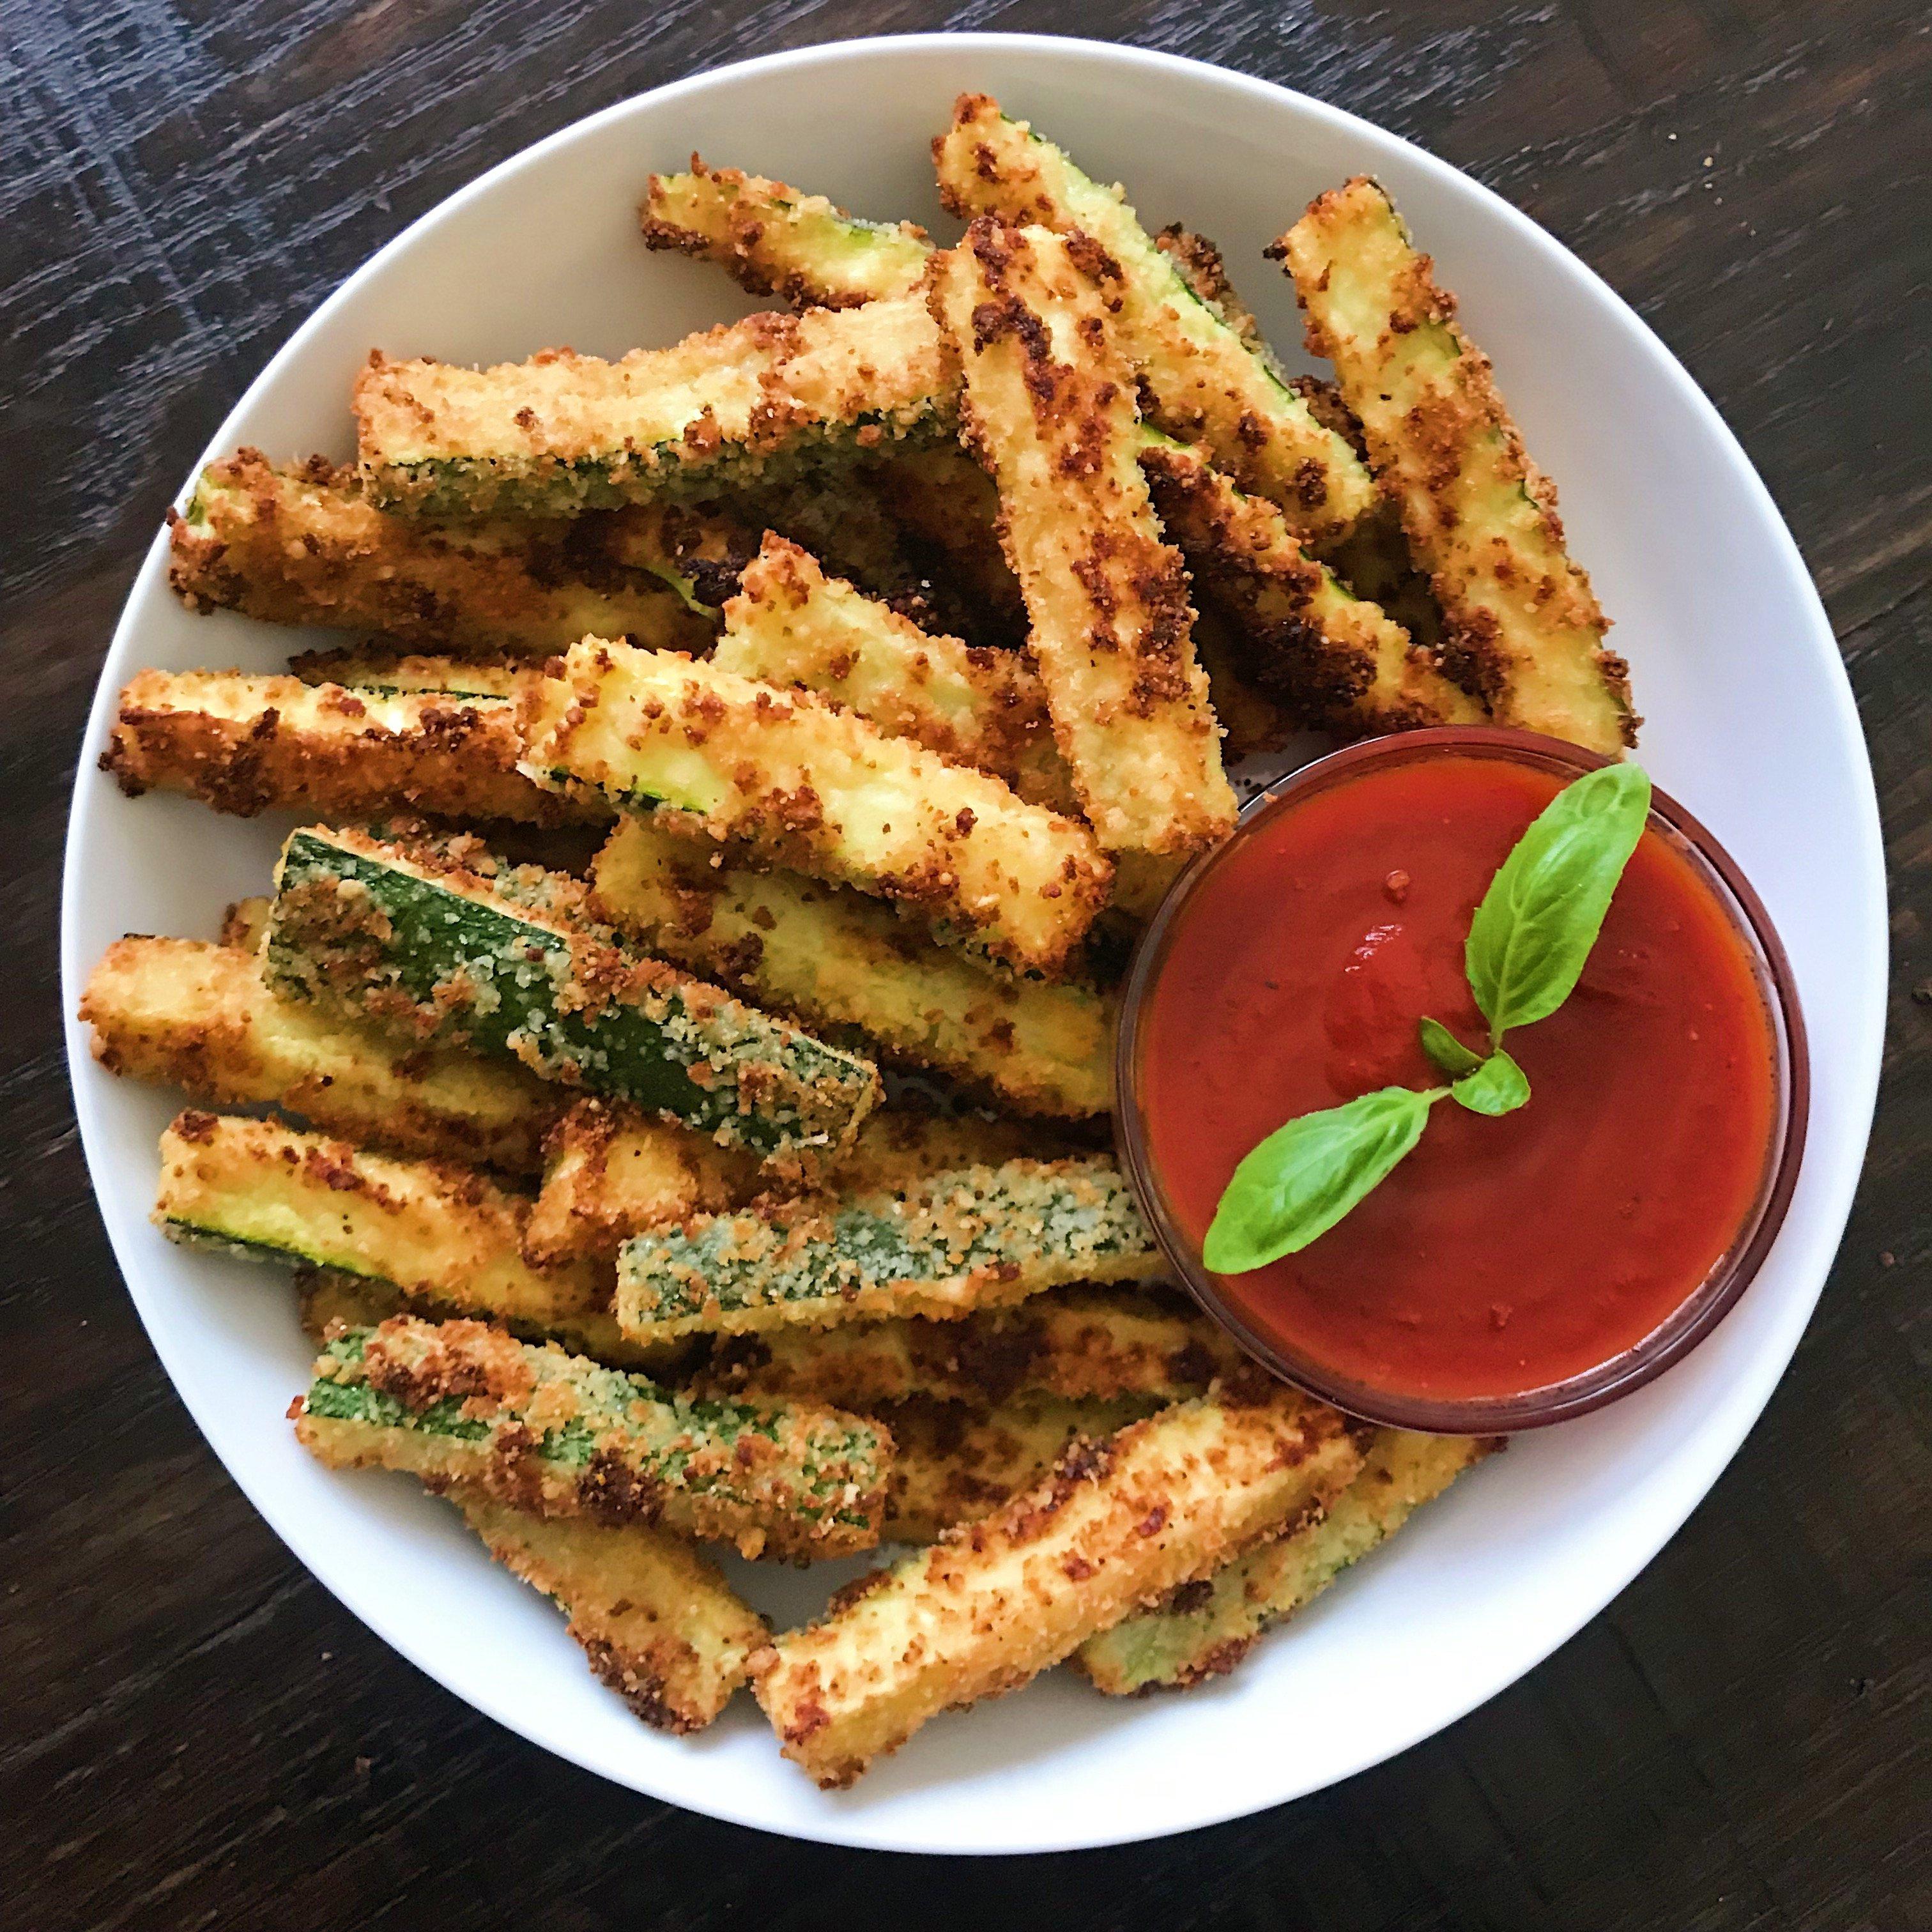 crispy zucchini fries glutlen free #glutenfree #glutenfreerecipes www.healthygffamily.com